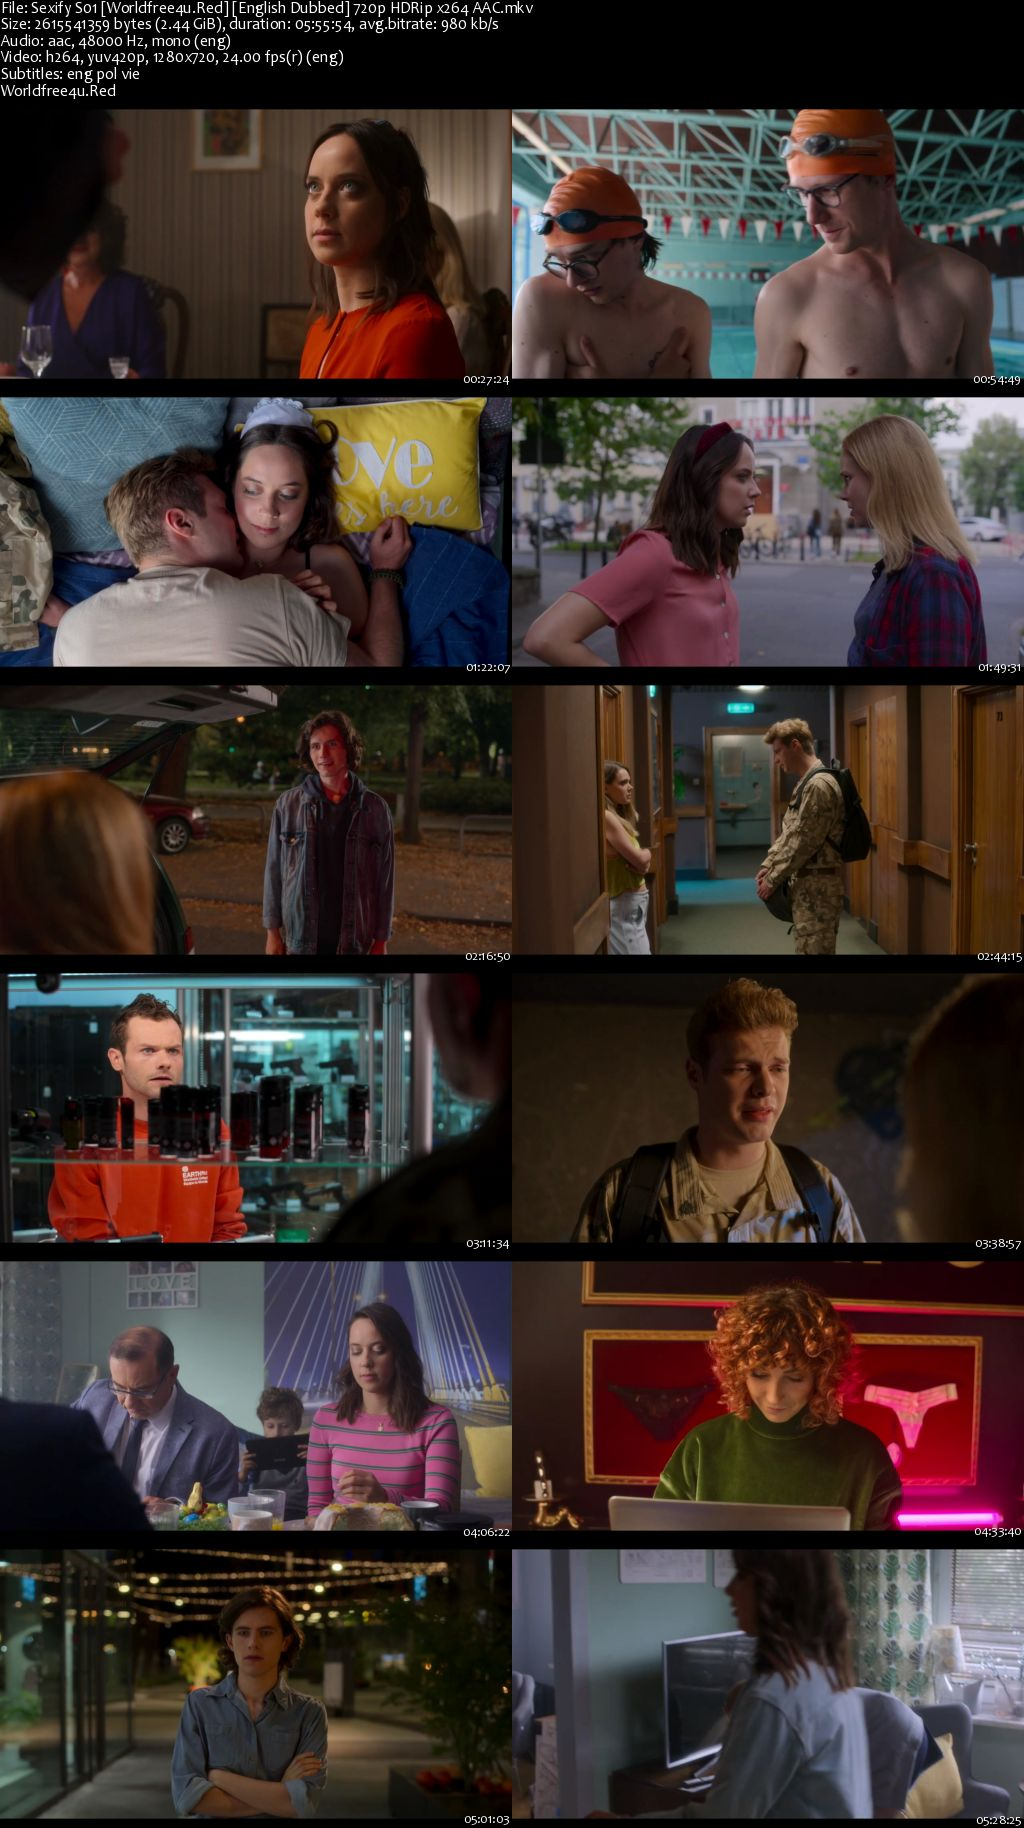 Sexify 2021 (Season 1) All Episodes HDRip 720p